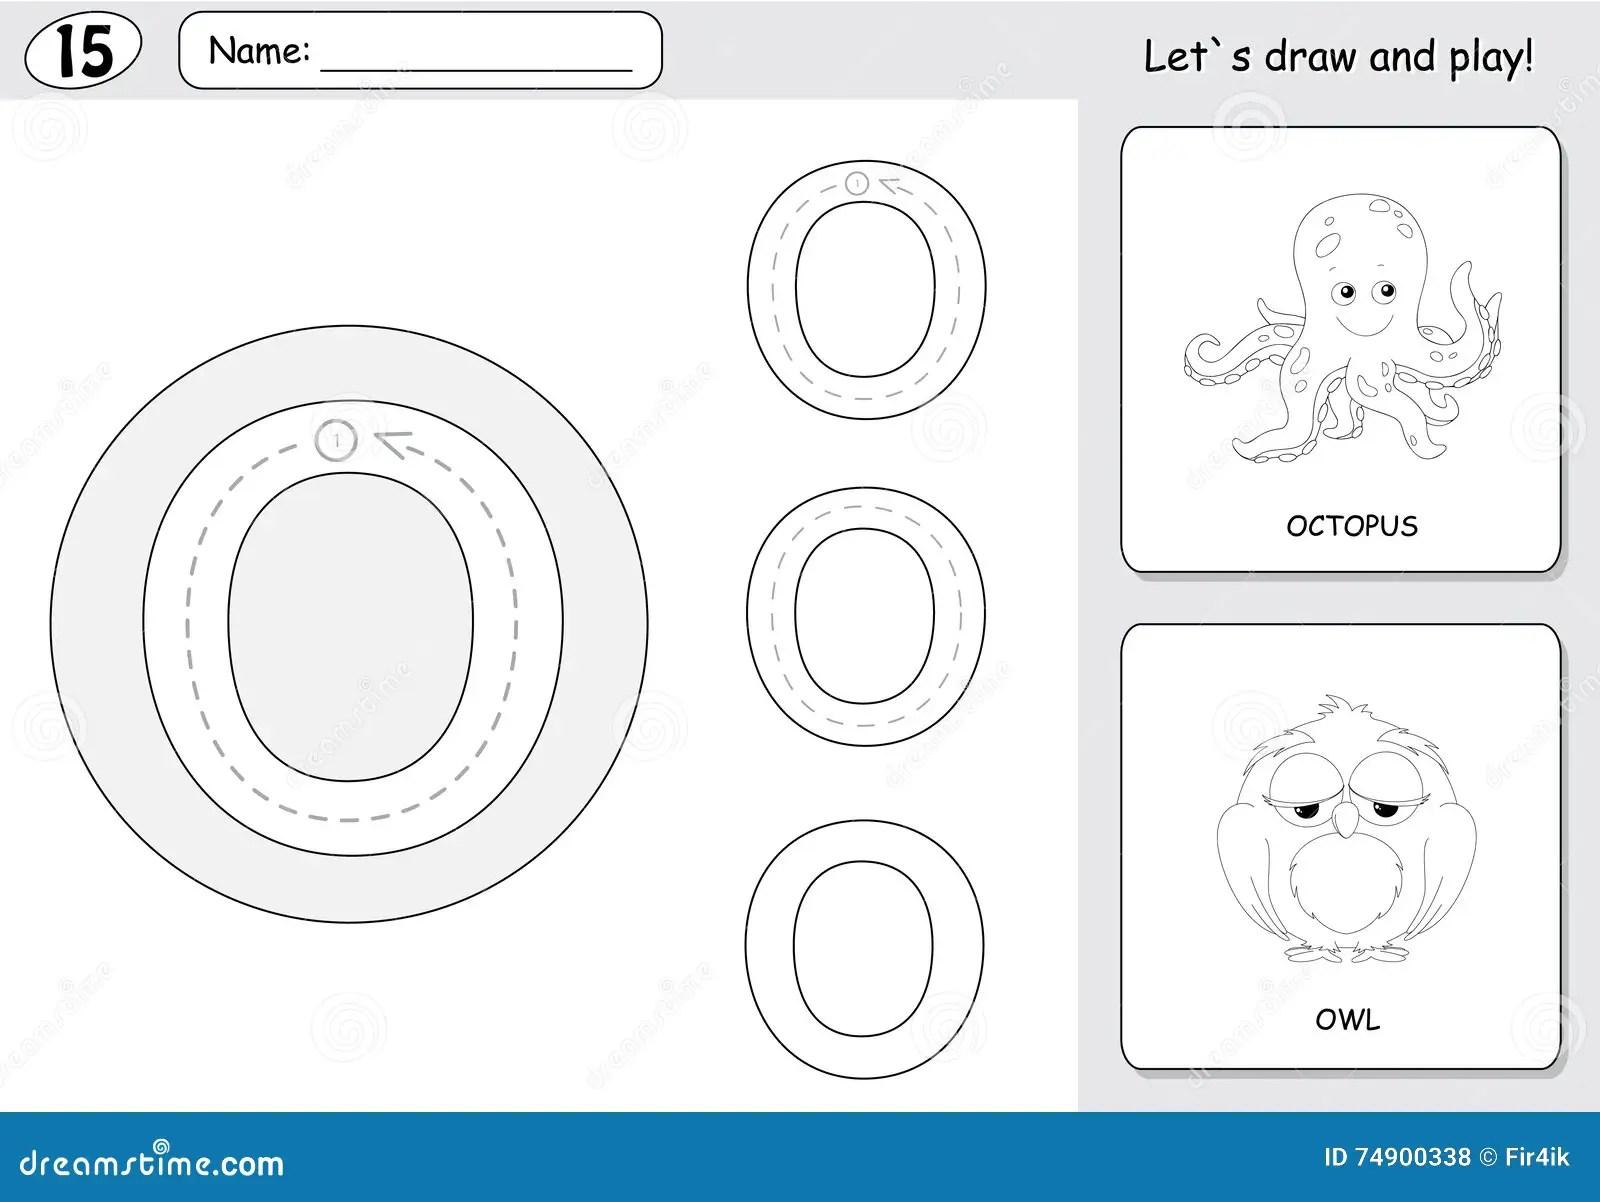 Cartoon Octopus And Owl Alphabet Tracing Worksheet Writing A Z Stock Vector